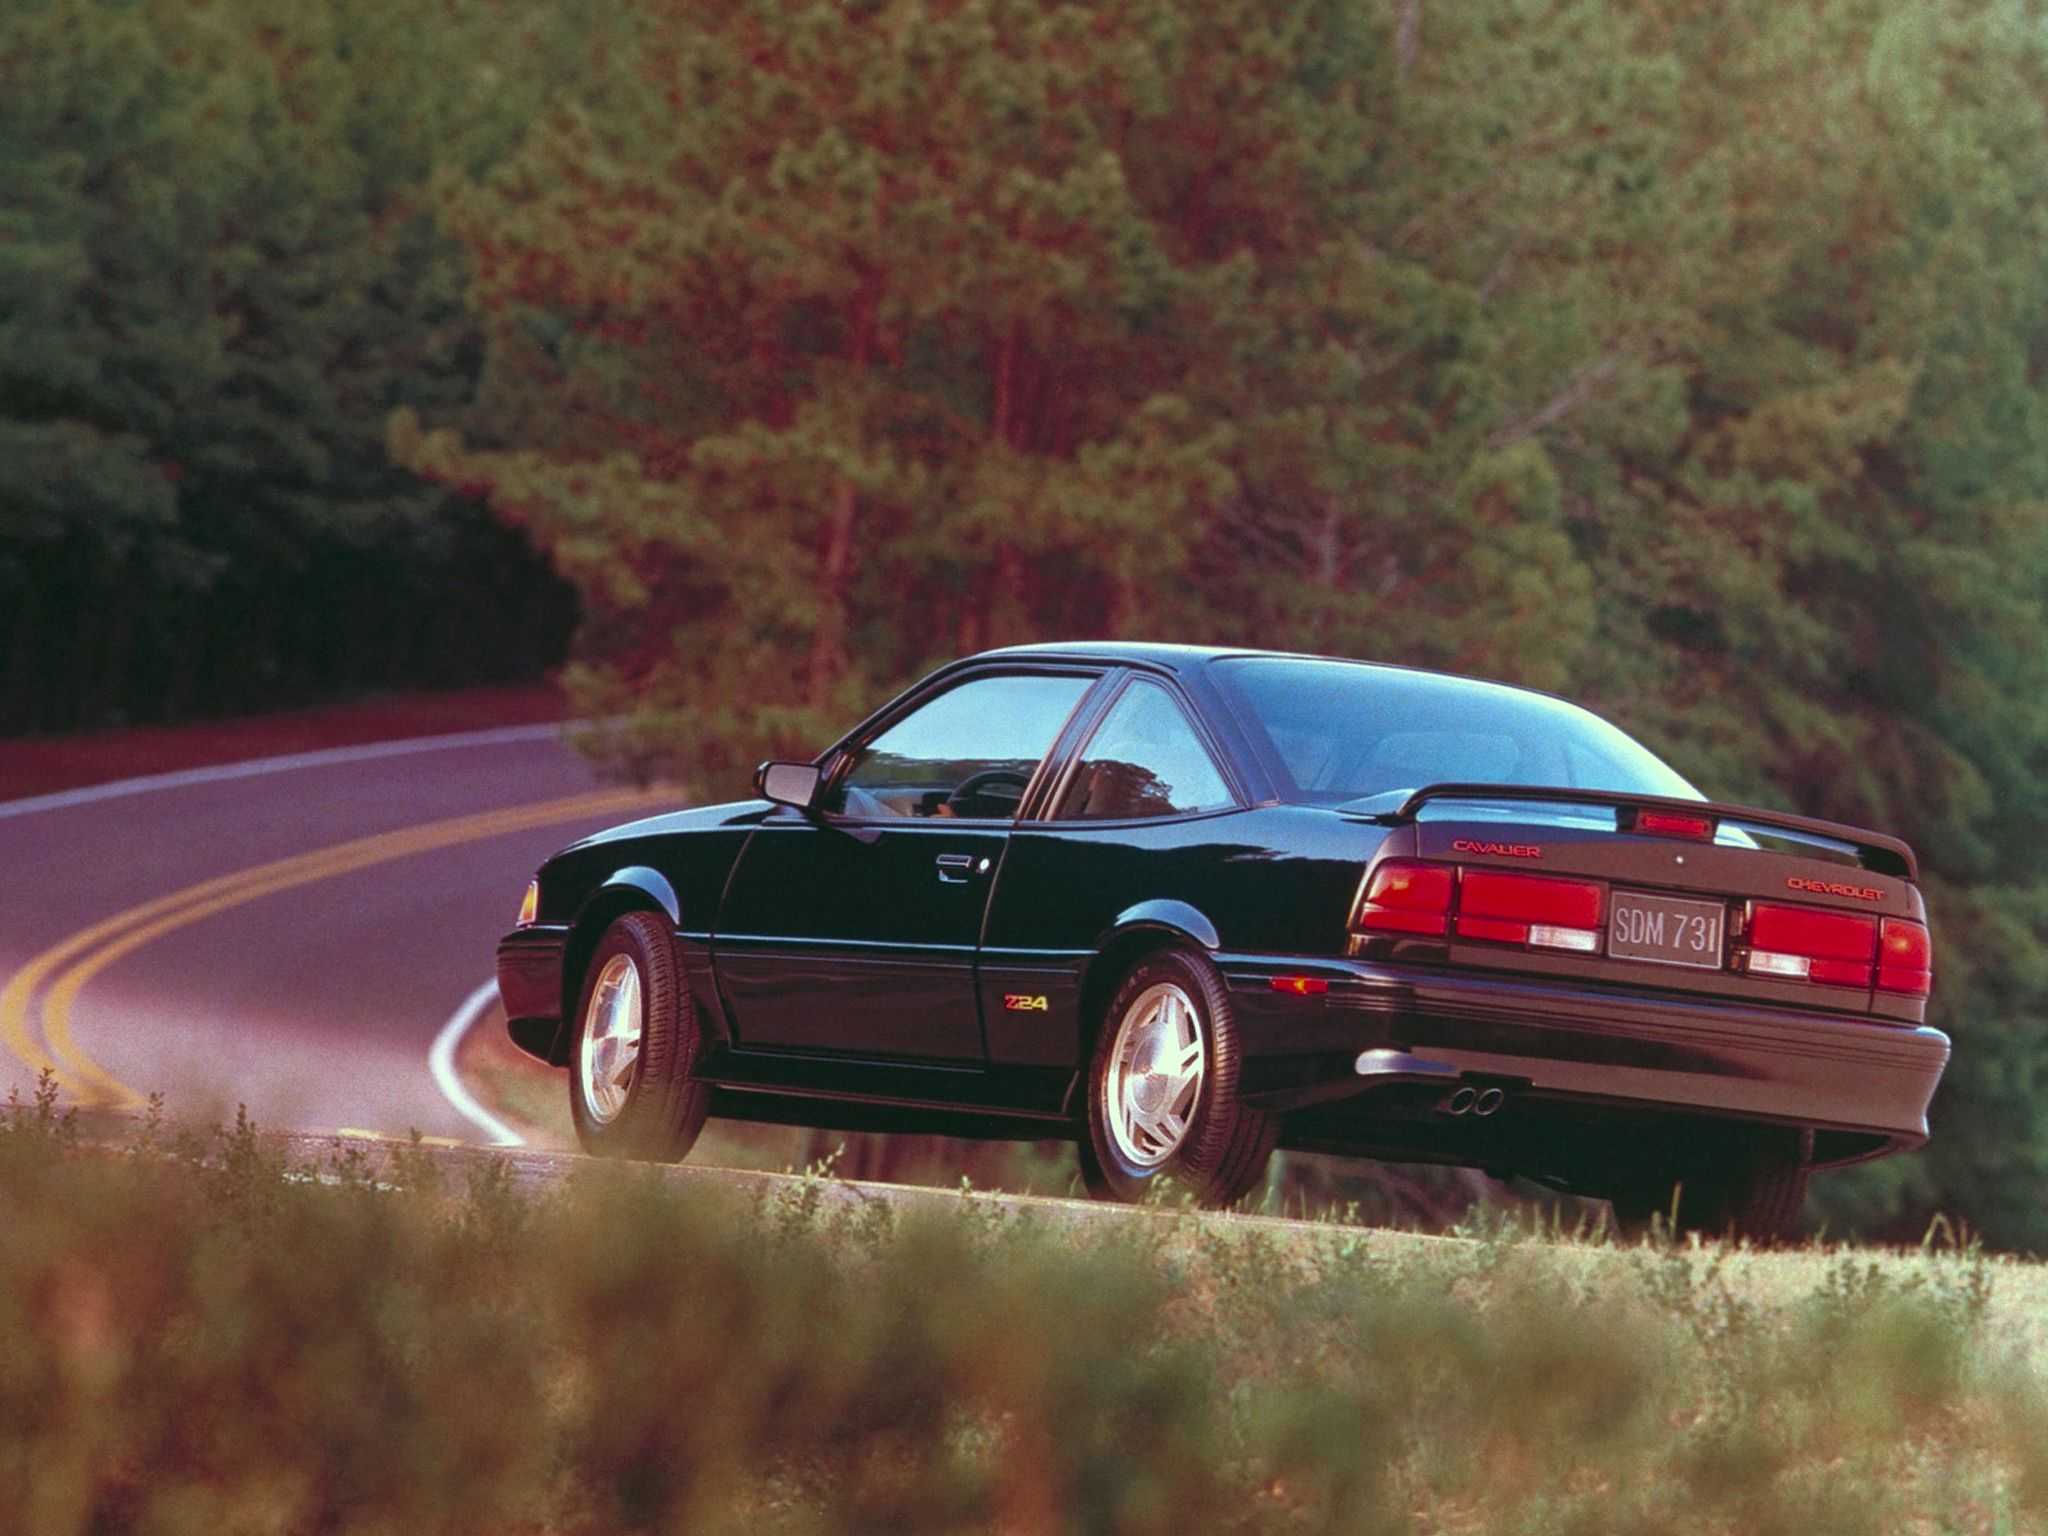 Chevrolet Cavalier Z24 Coupe 1991 1994 Wallpaper 432 Coupe Cavalier